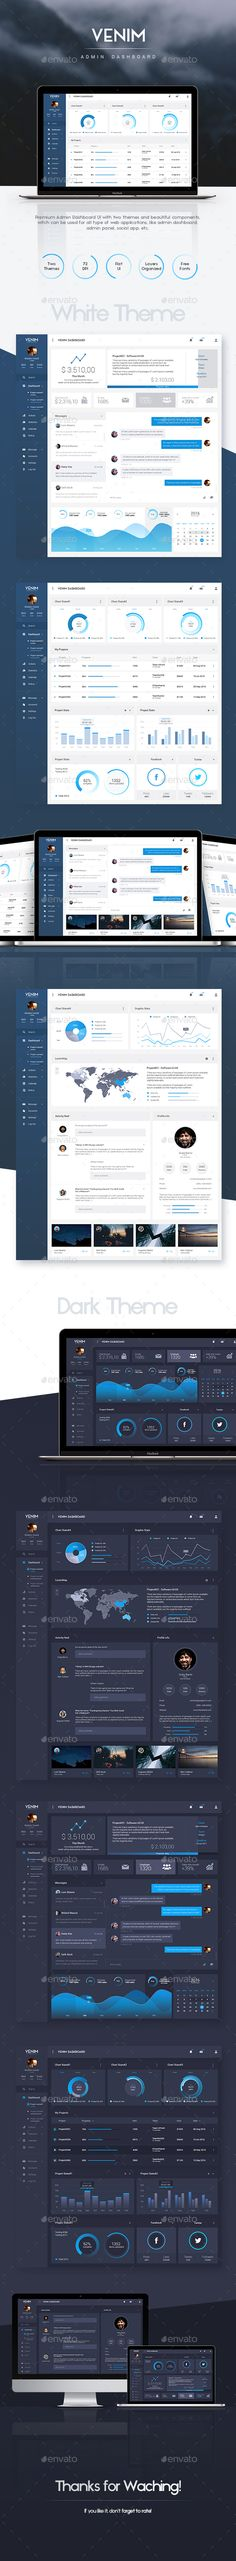 Admin Dashboard UI Template